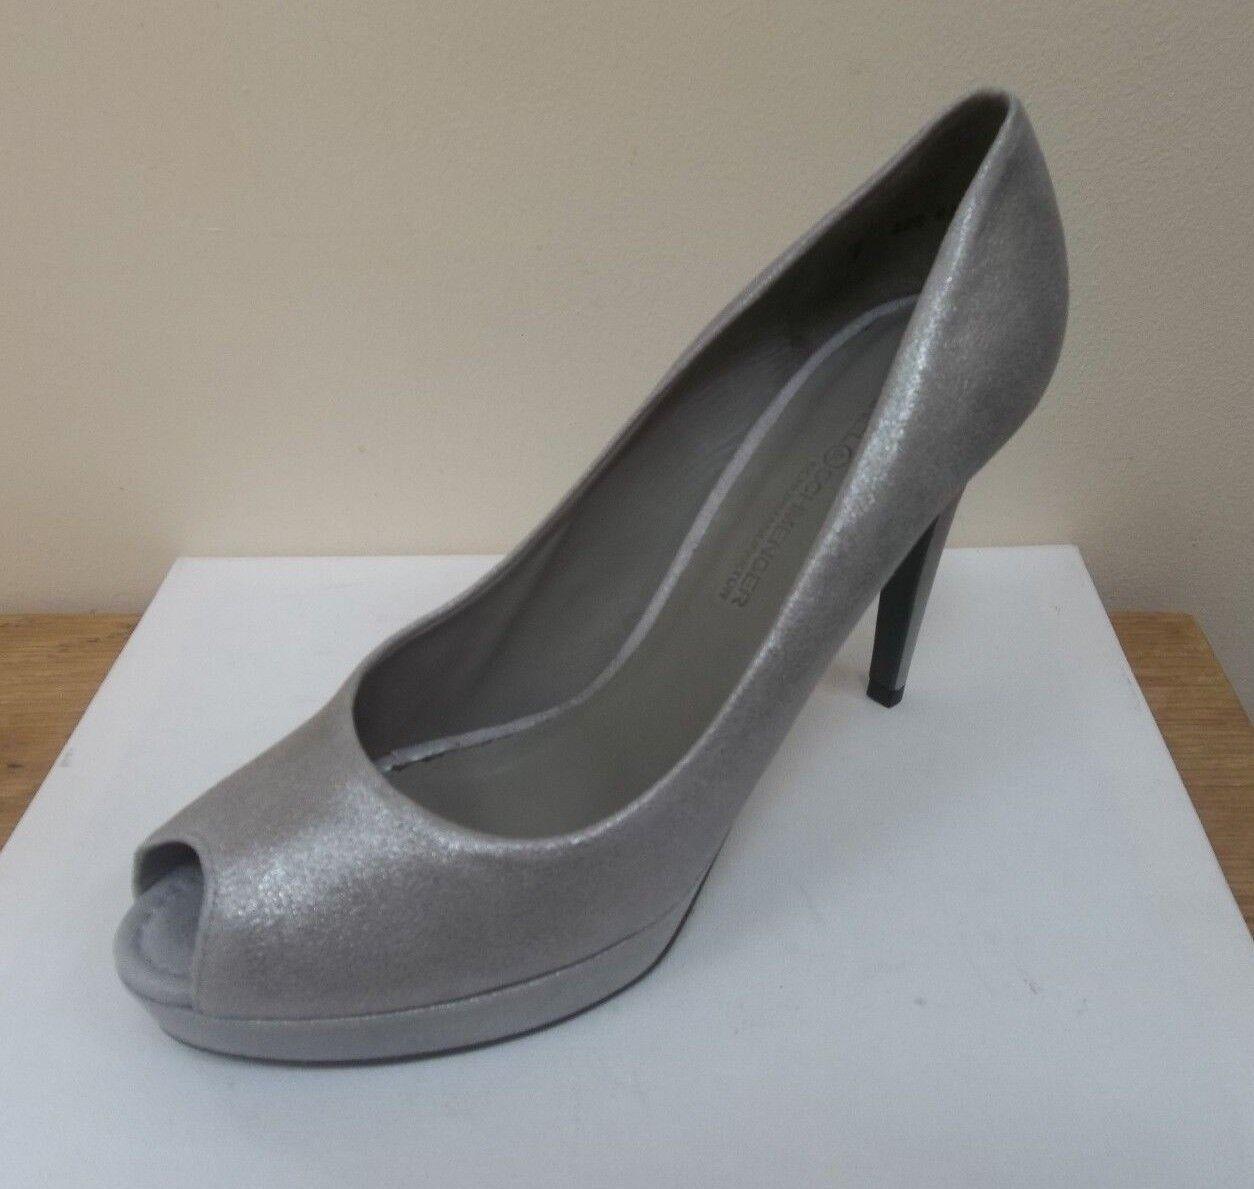 K&S Gia Grau-silver suede peep toe platform courts, UK 8/EU 41,   BNWB